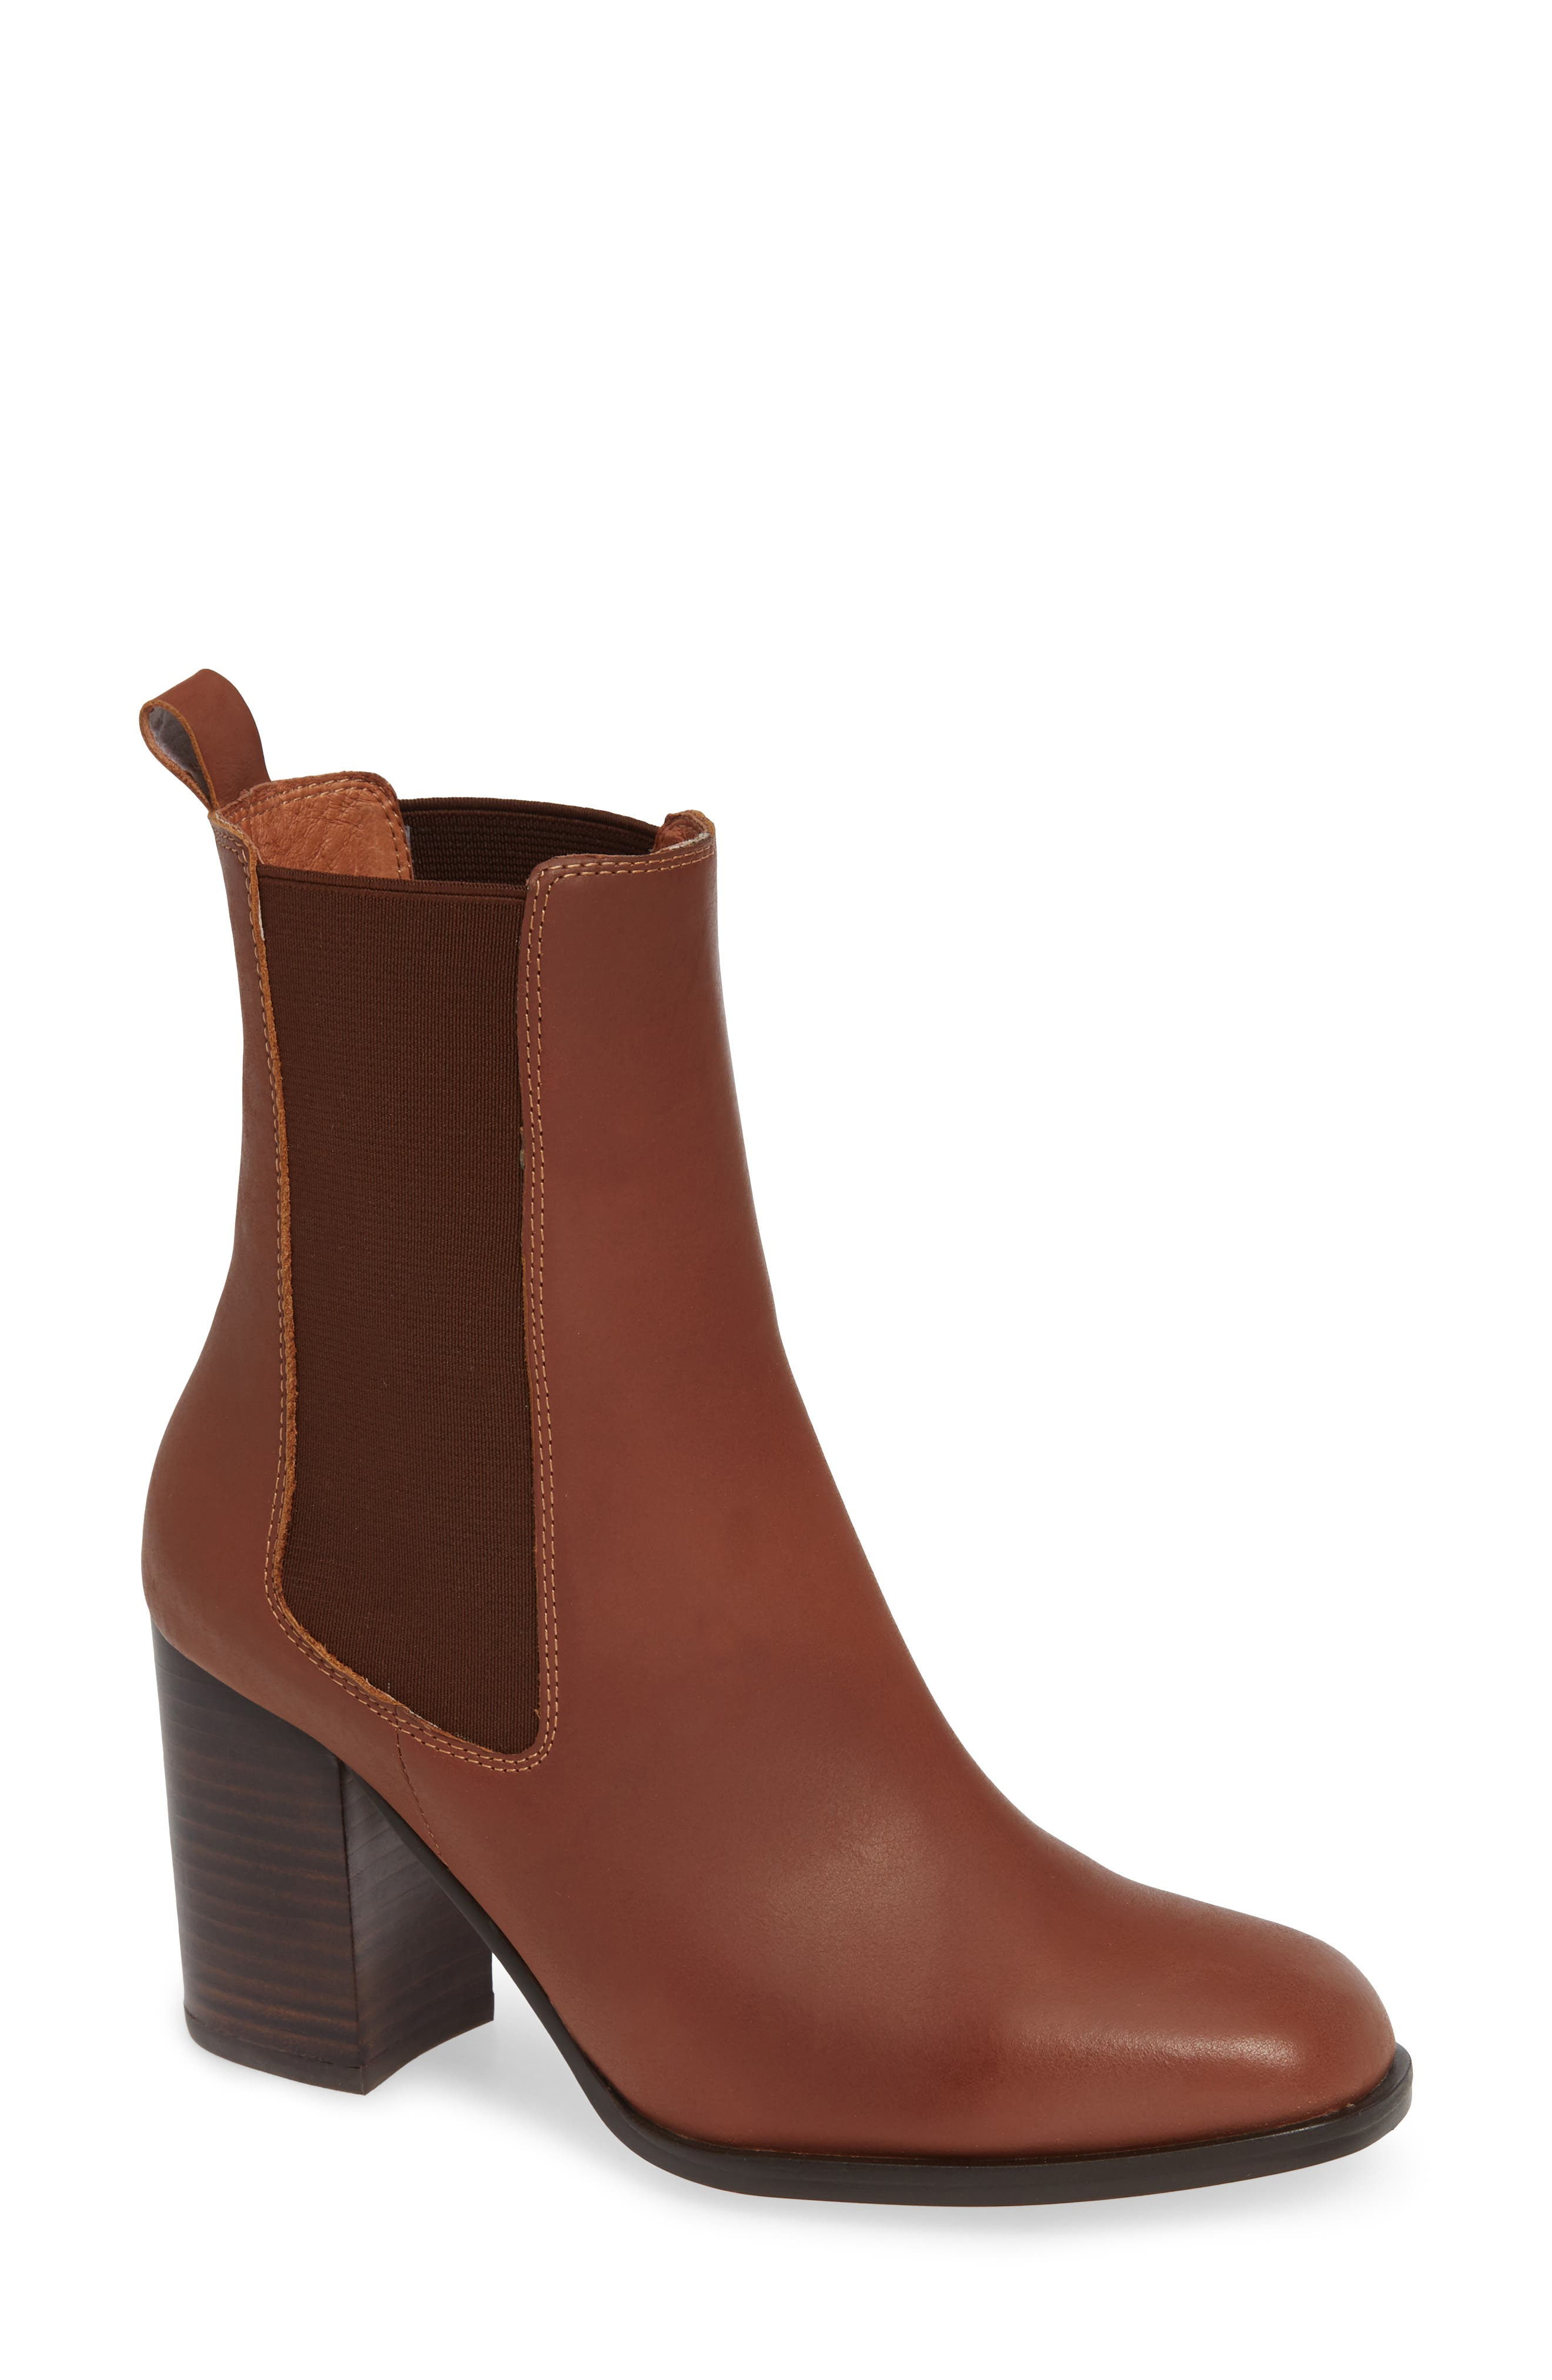 ALIAS MAE Nyala Chelsea Bootie in Tan Leather